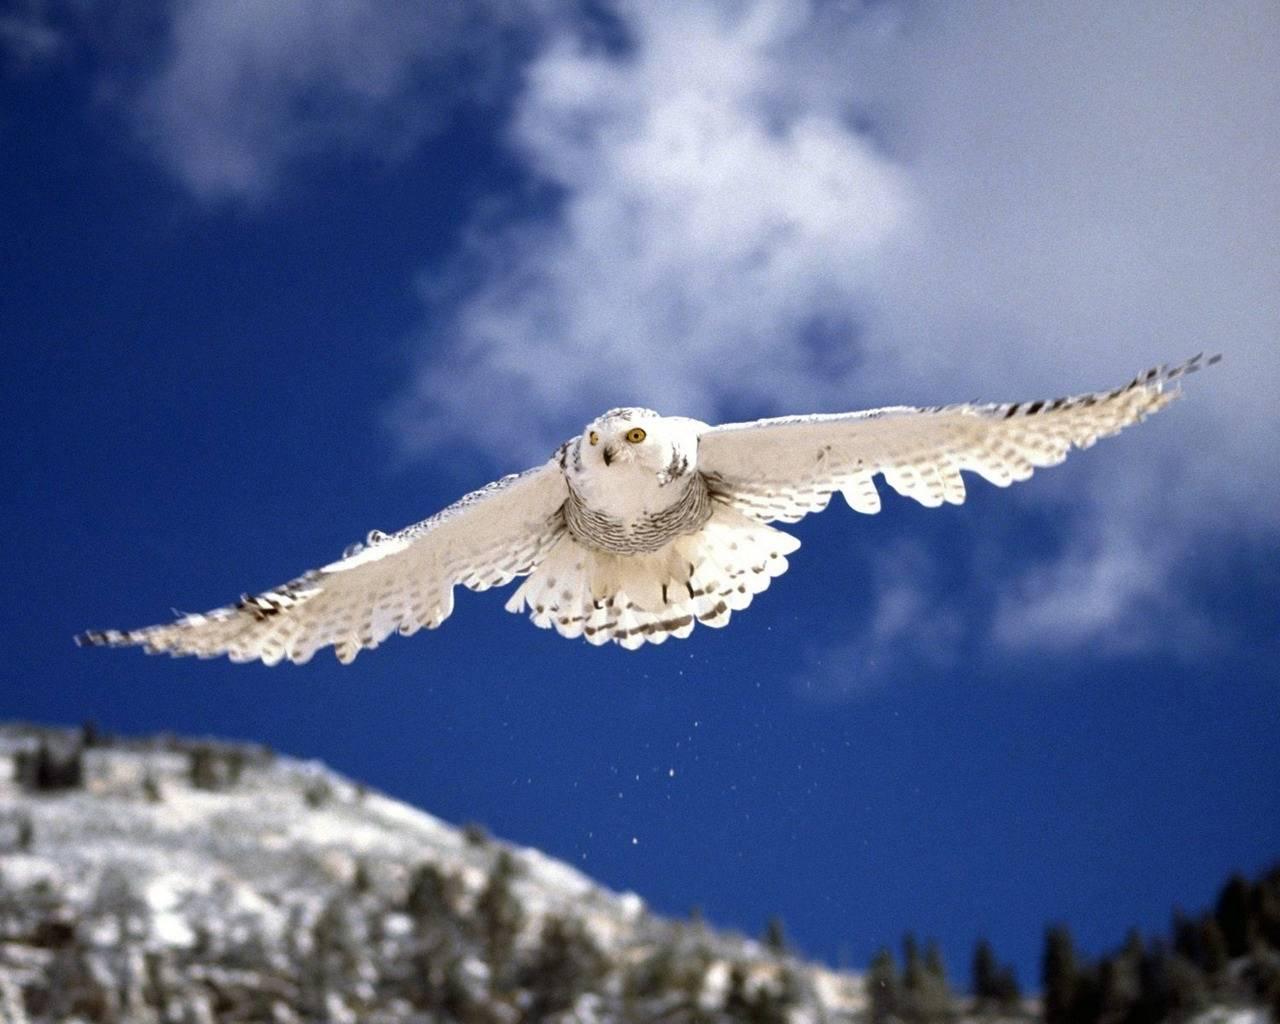 http://3.bp.blogspot.com/-BbmaHEEQvA4/T8oTKXcBVPI/AAAAAAAAJdA/vp_CrThZTeI/s1600/white-owl-wallpaper.jpg